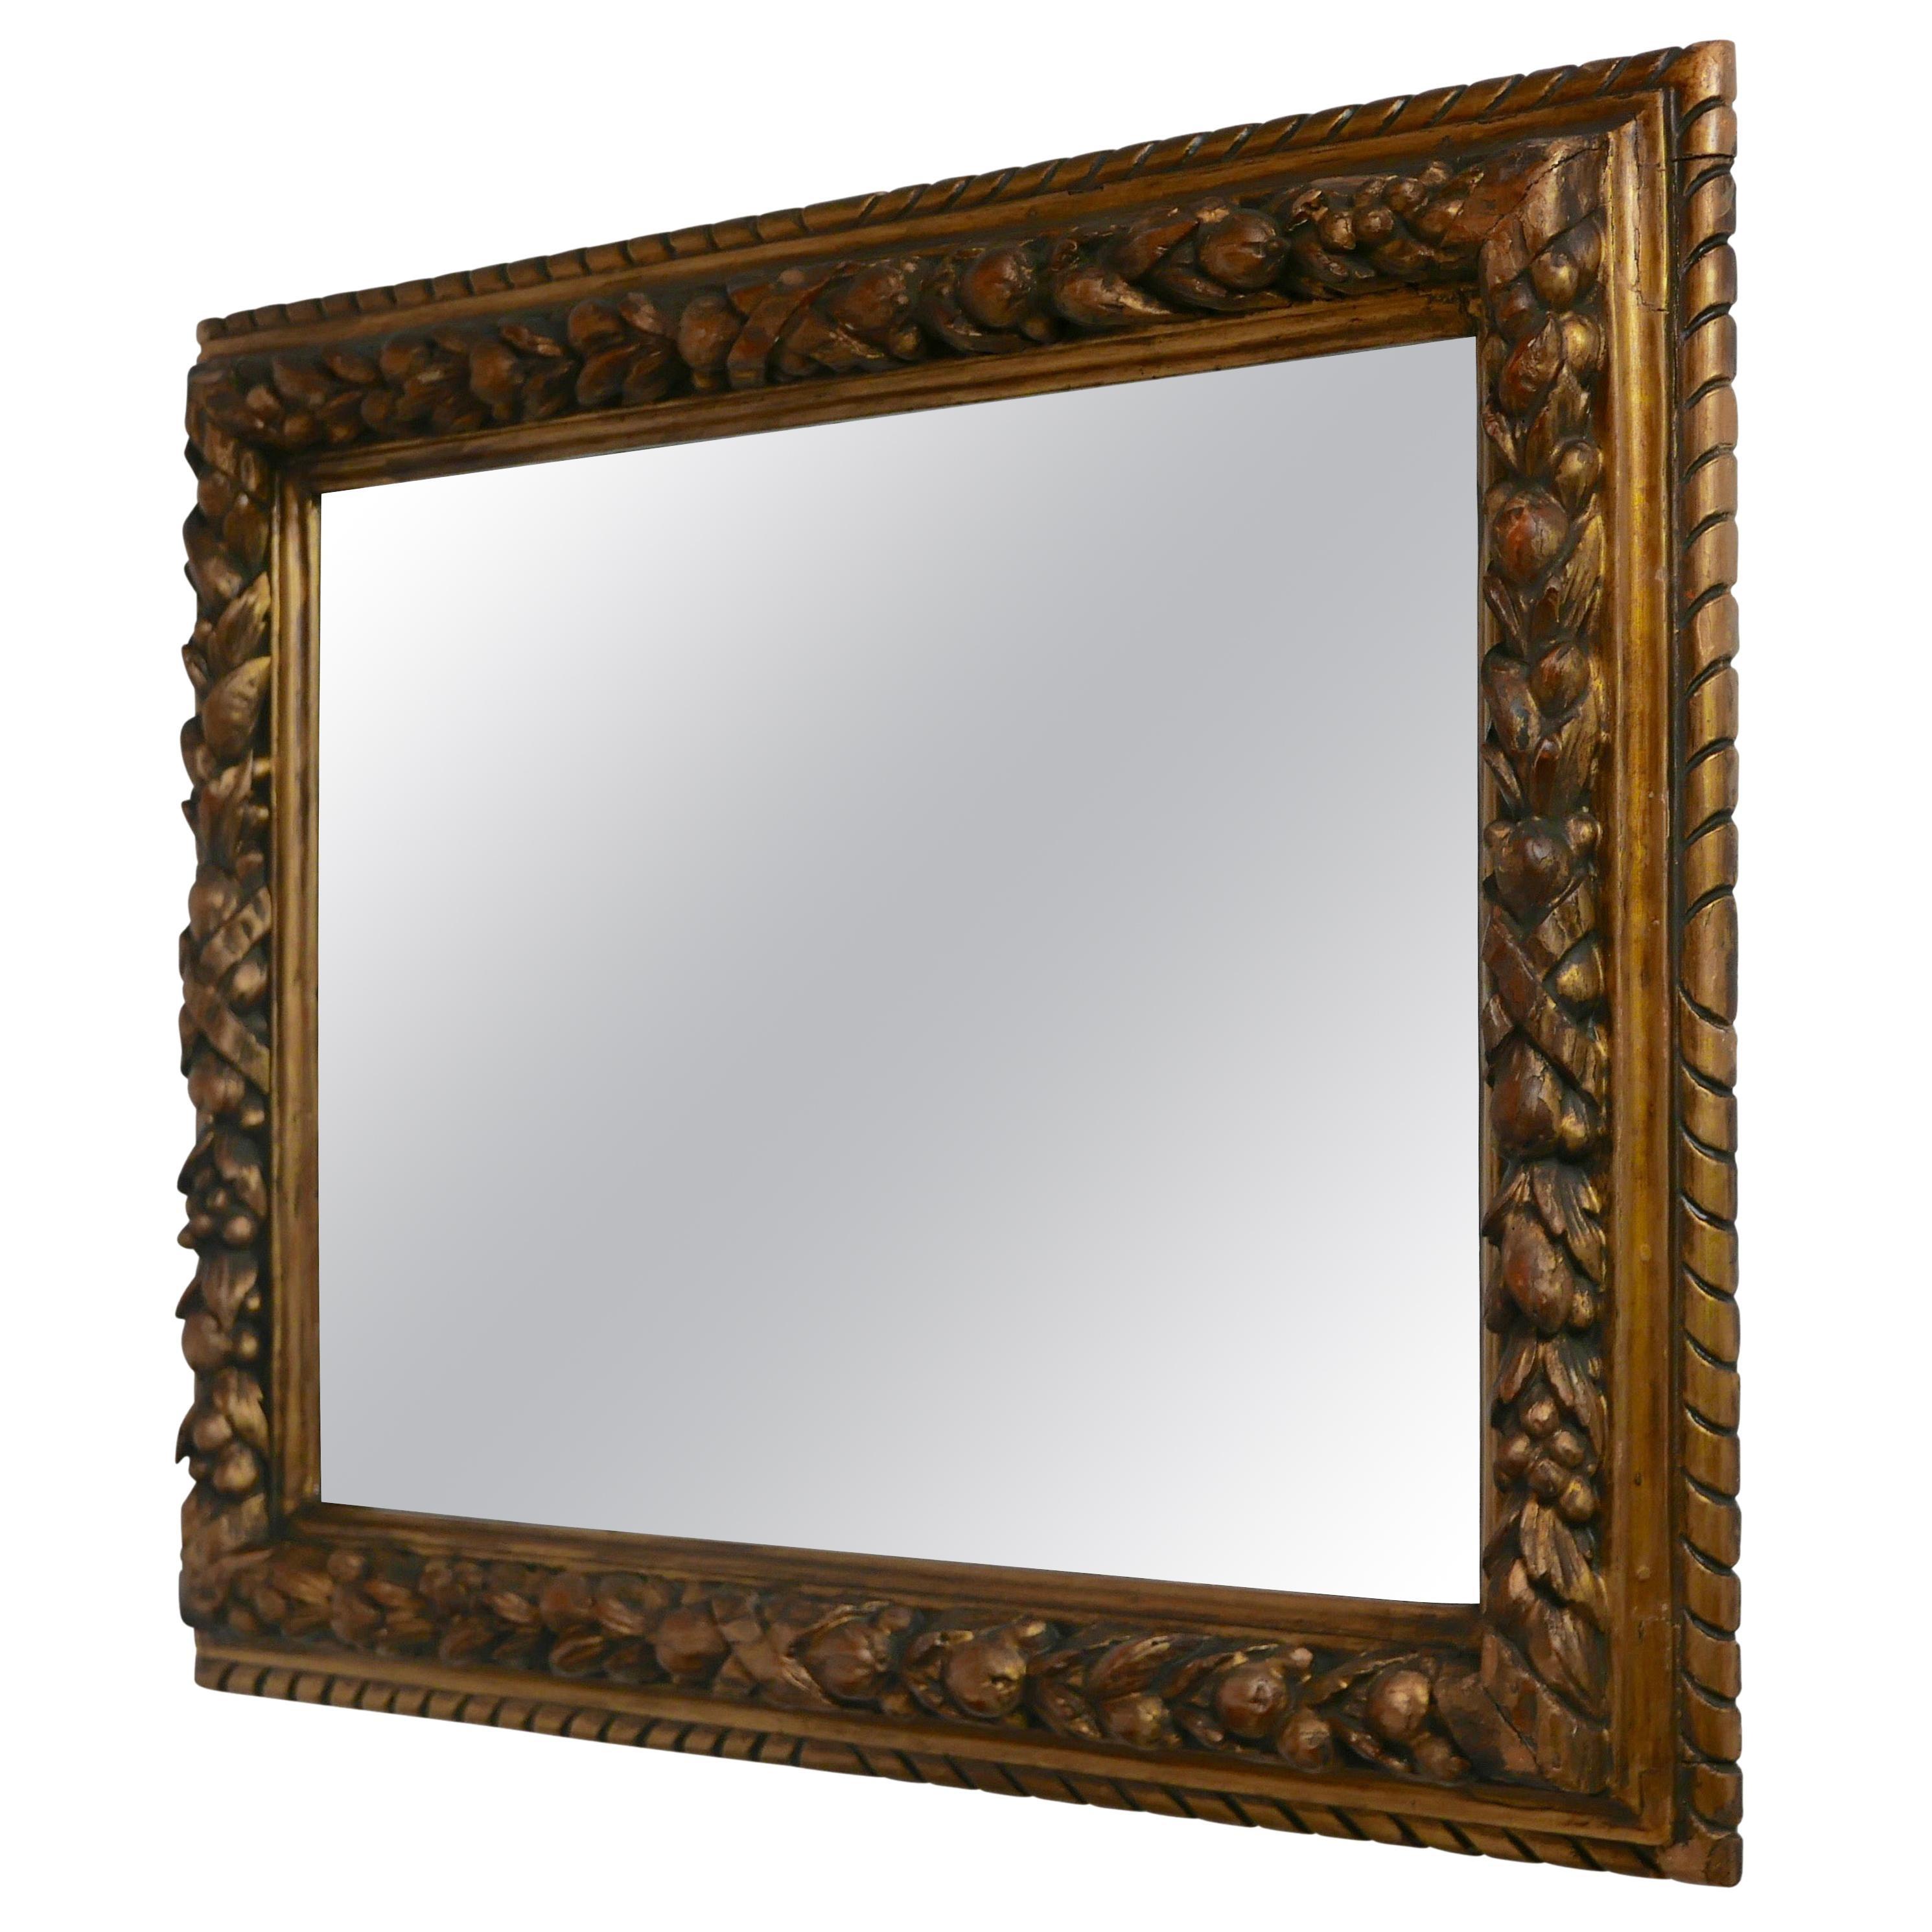 Carved Fruit and Gilt Framed Mirror, Italian, 19th Century